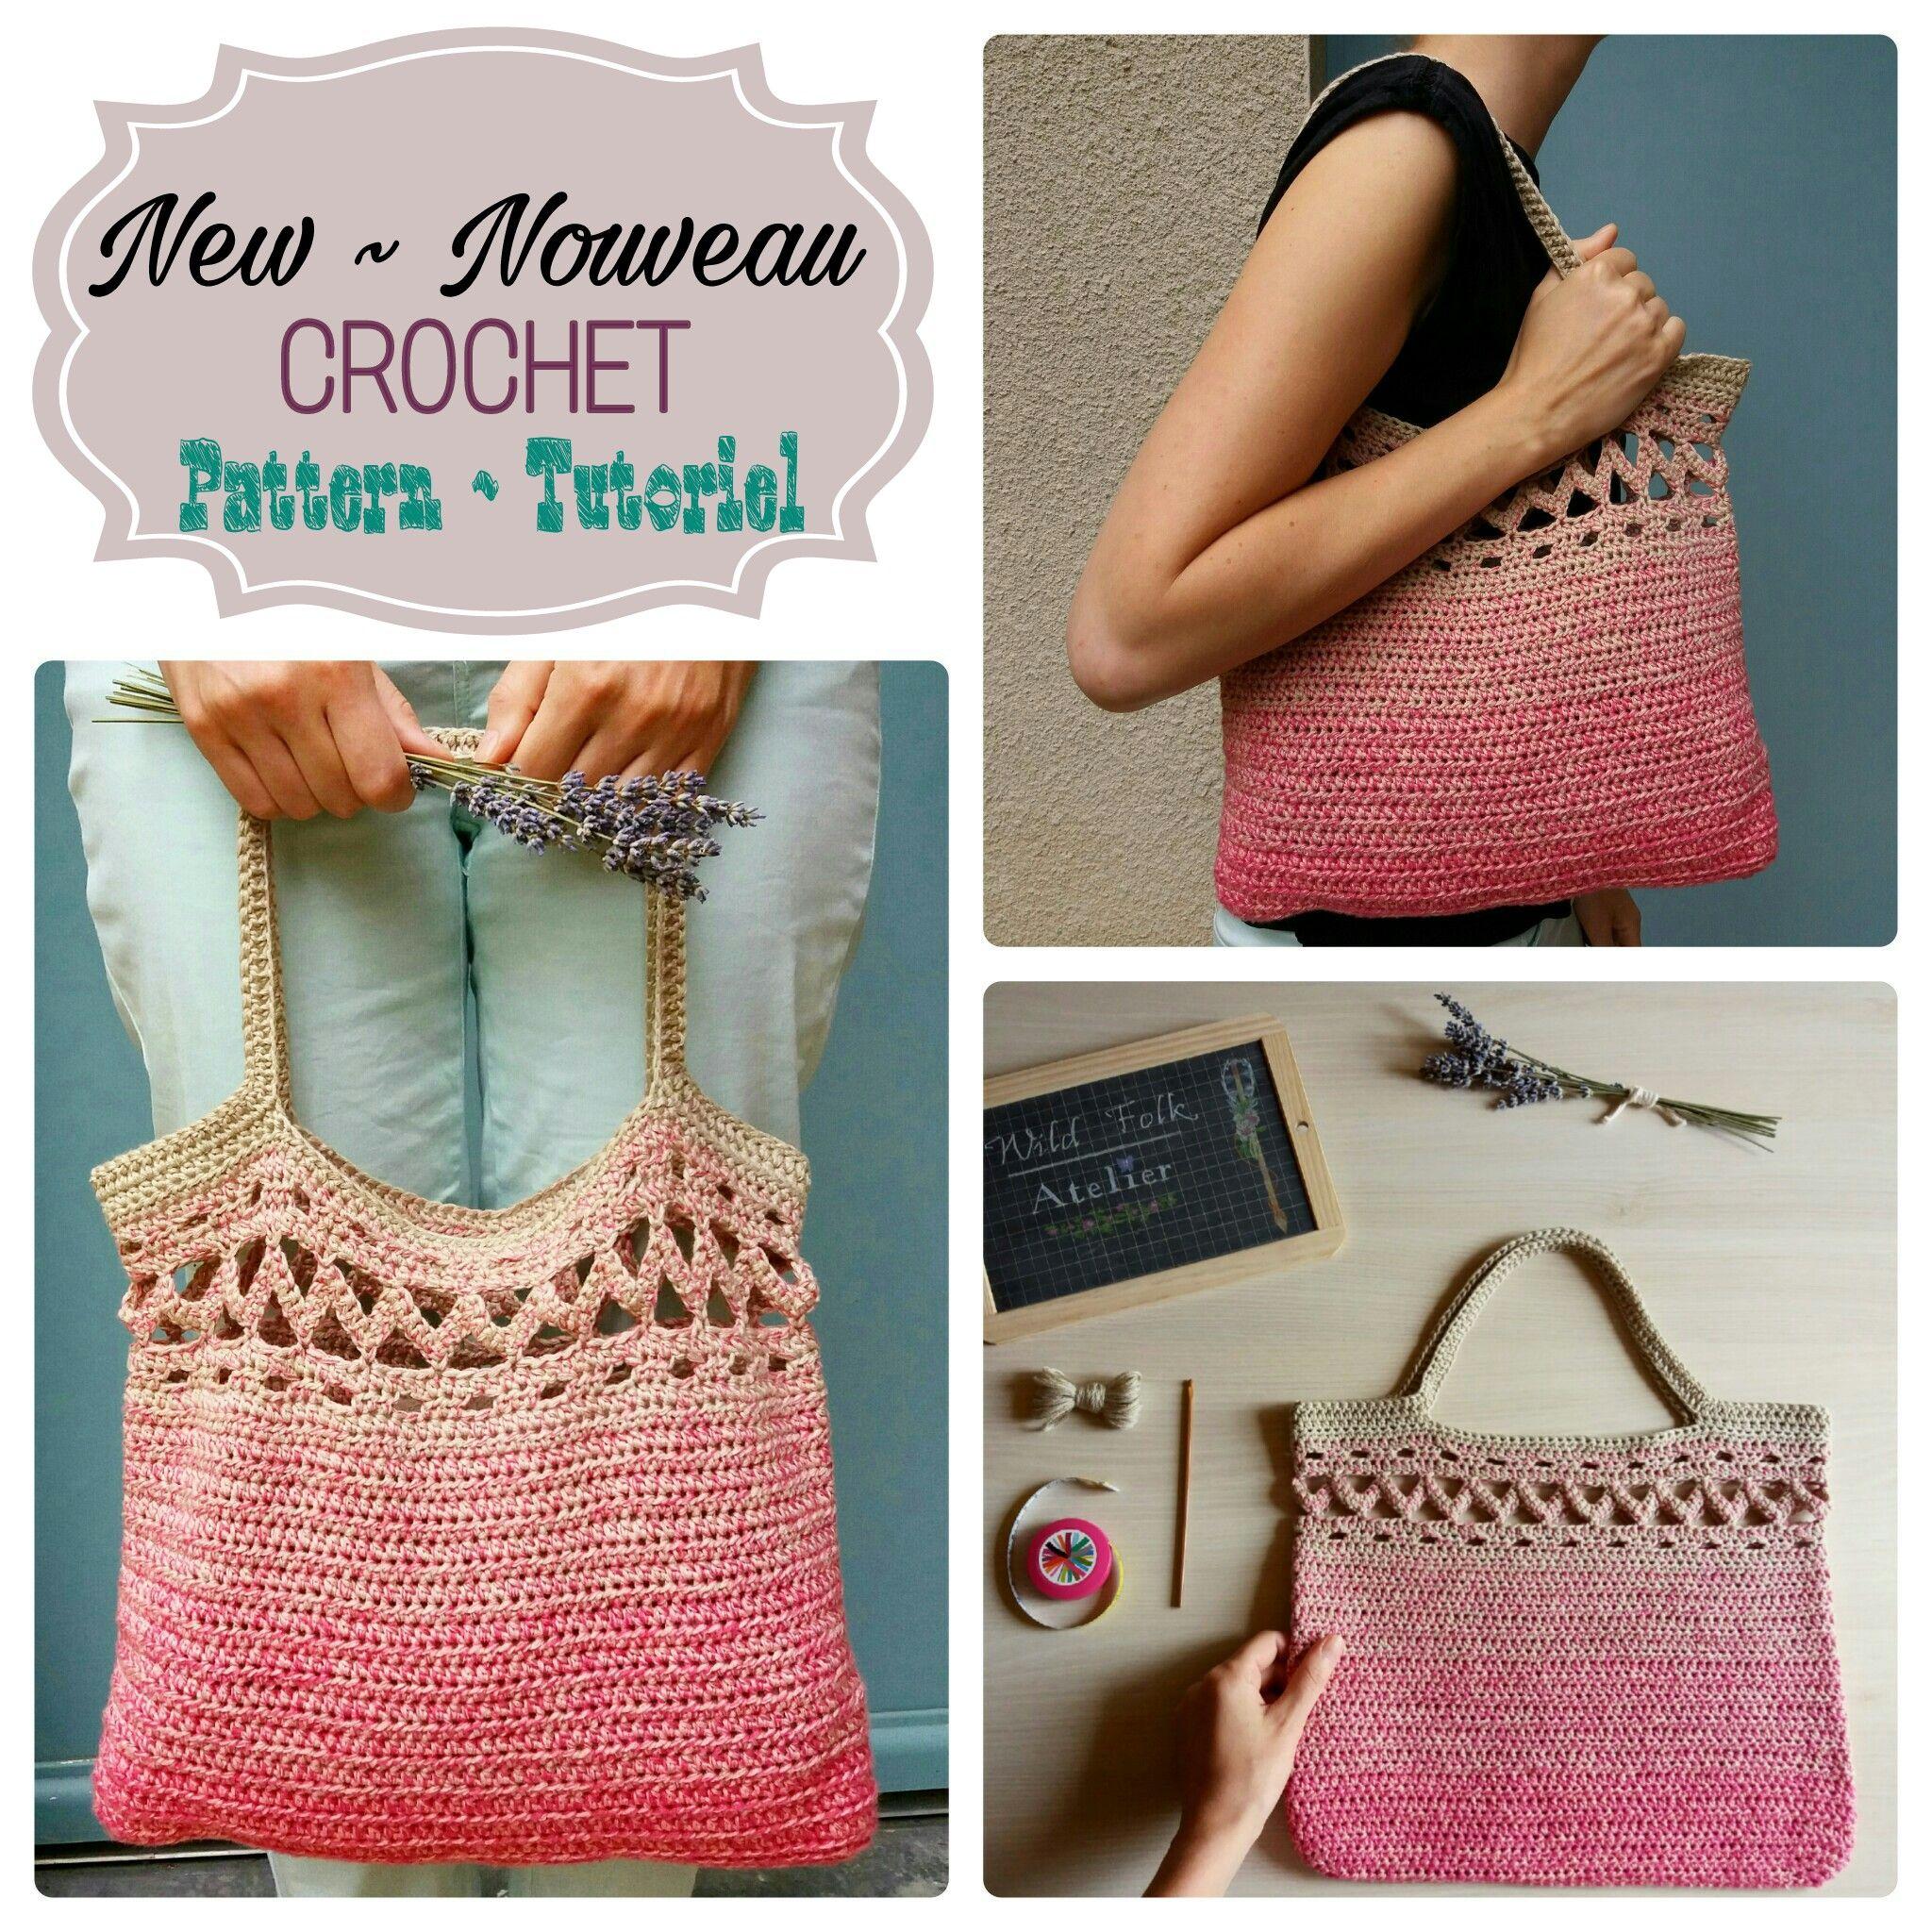 Patron Sac Boho Au Crochet Crochet Boho Bag Pattern